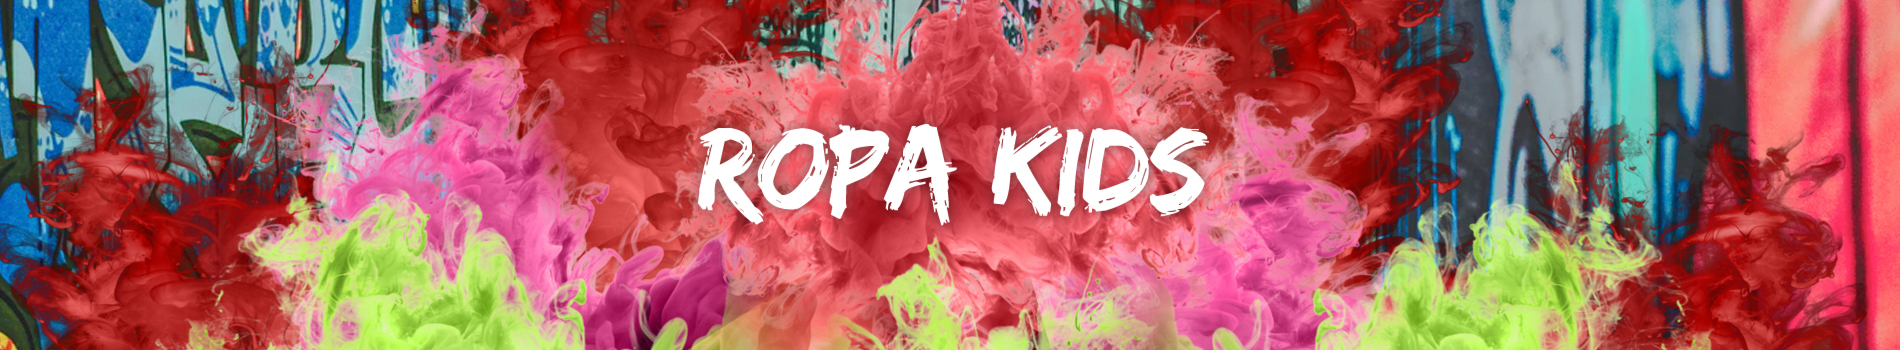 Ropa Kids